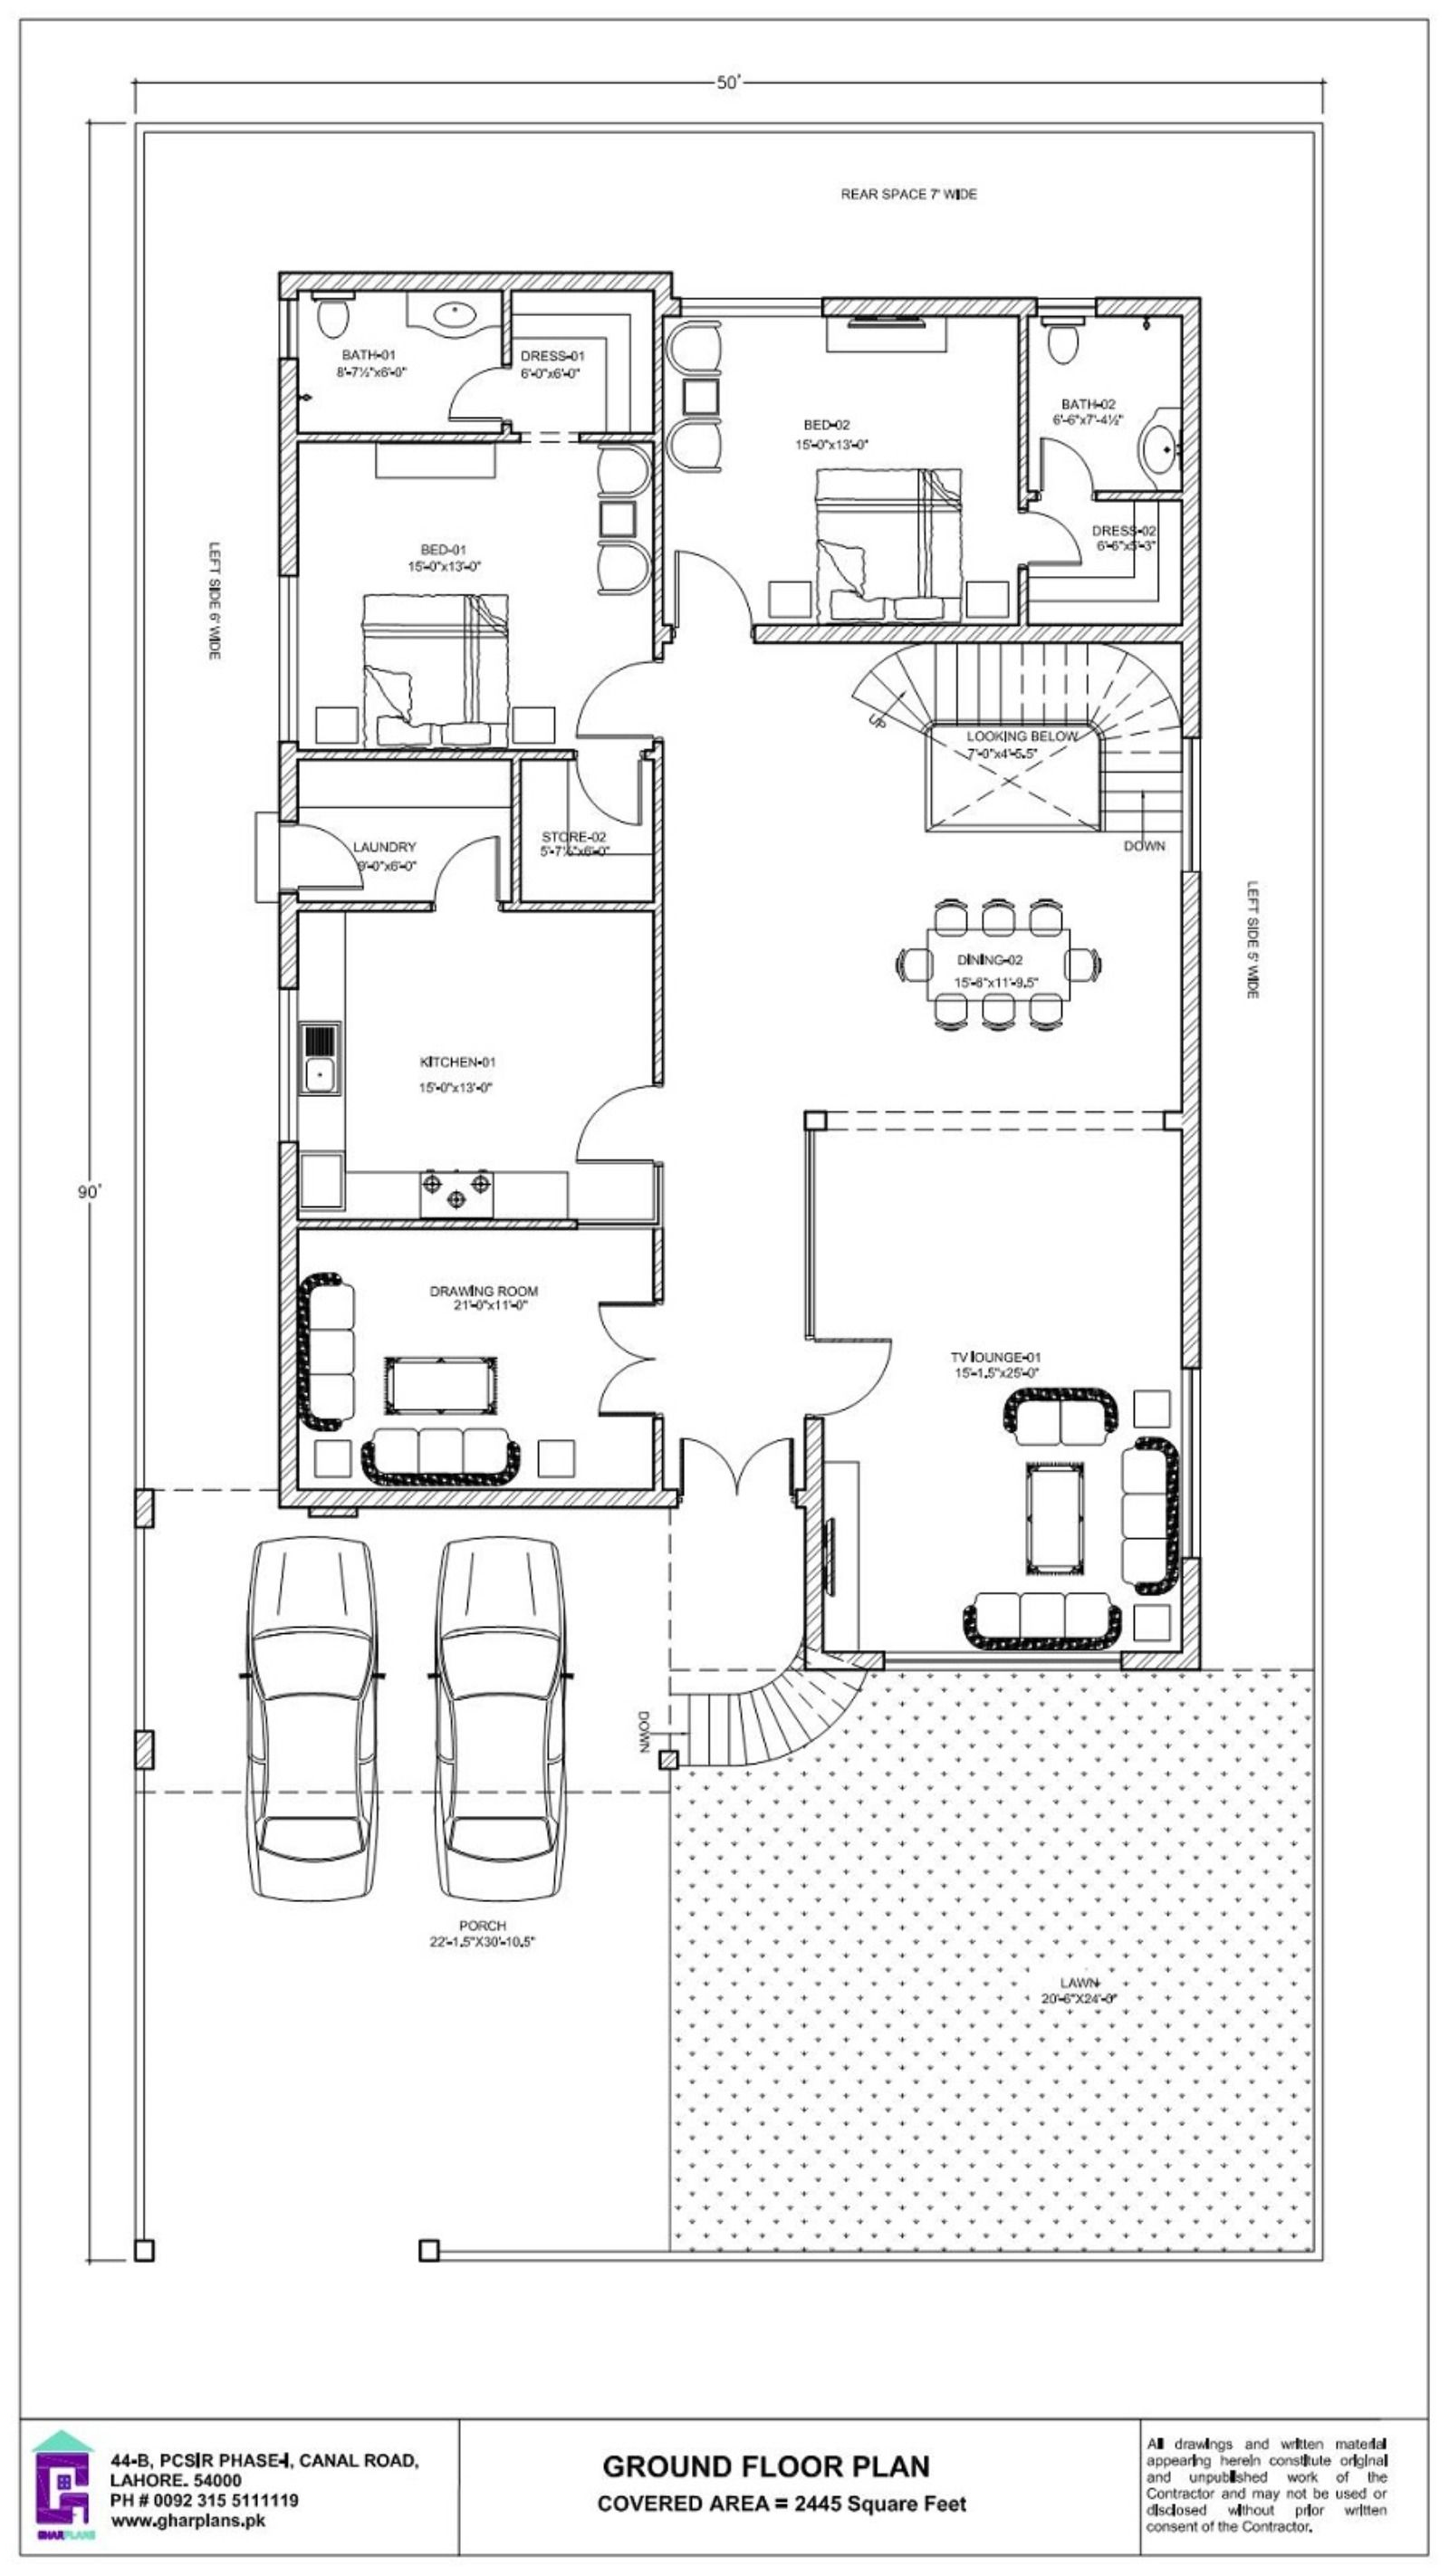 1 Kanal Home Design Idea 50 X 90 Ground Floor Plan Basement House Plans Ground Floor Plan Floor Plans